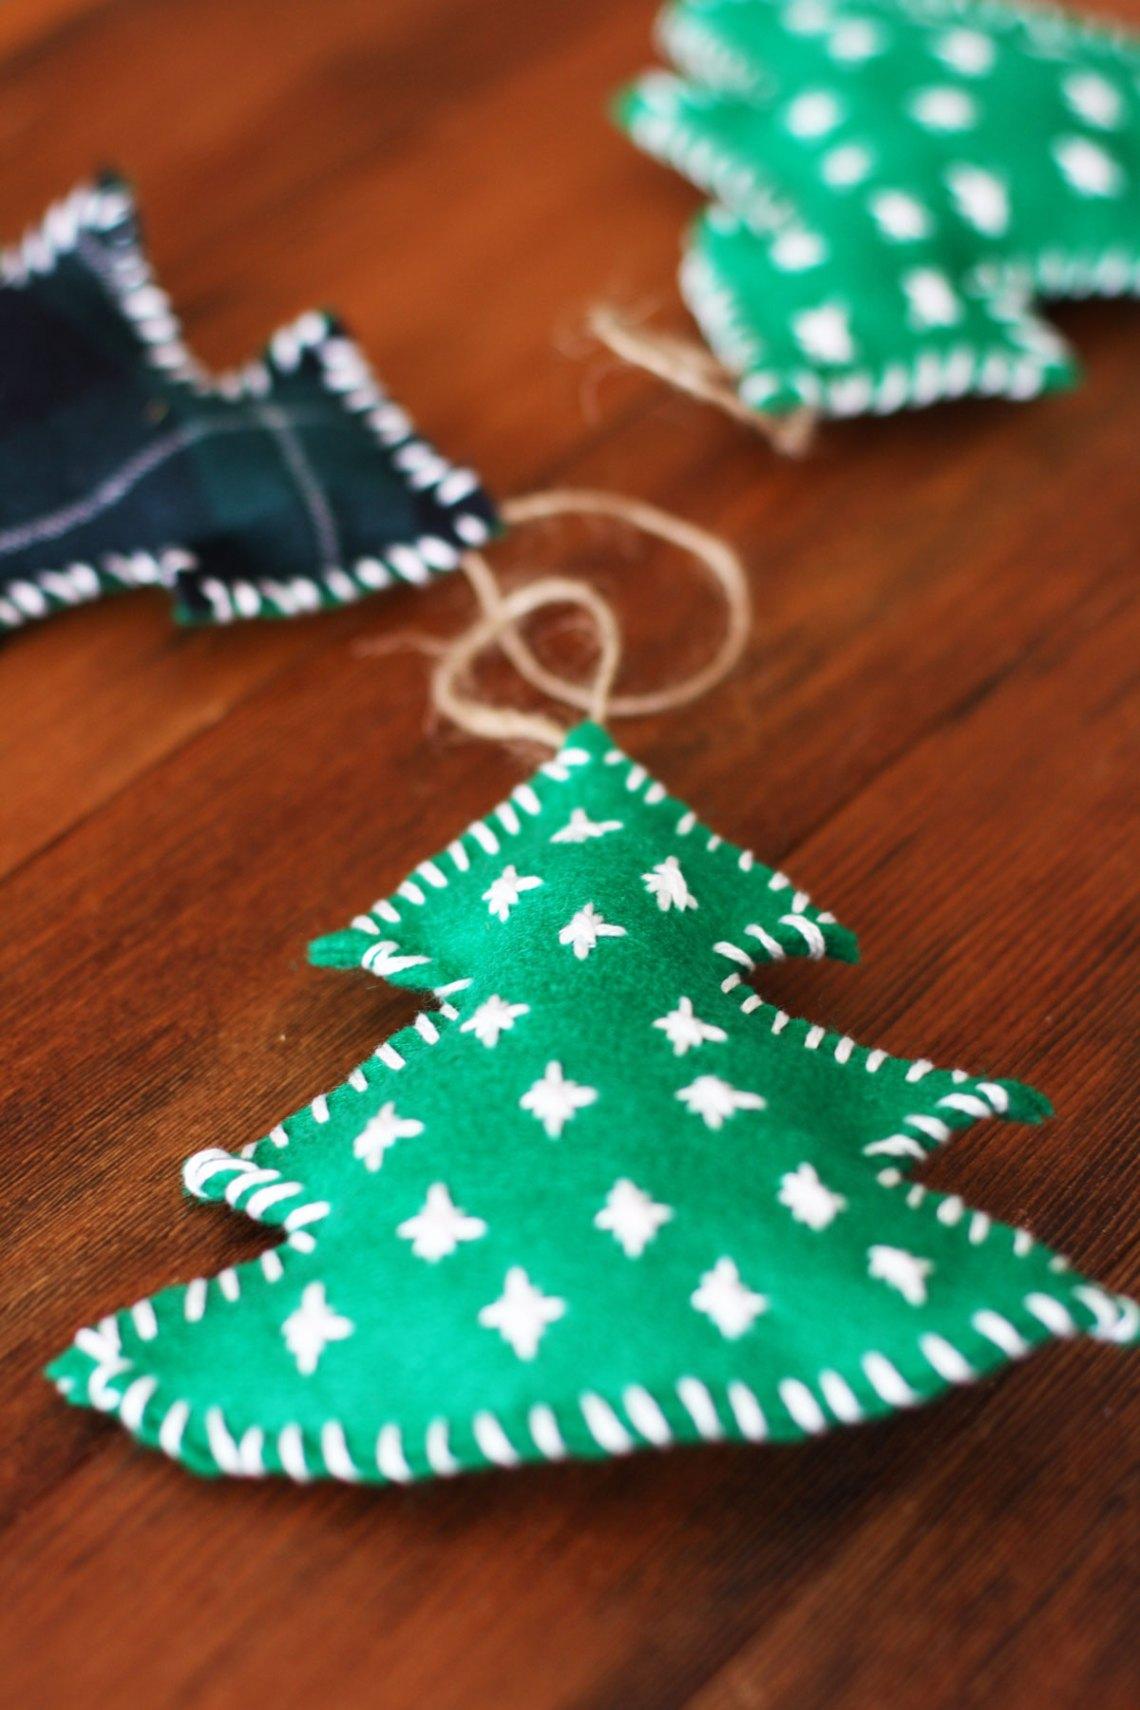 How to Make an Easy Felt Christmas Tree Ornament